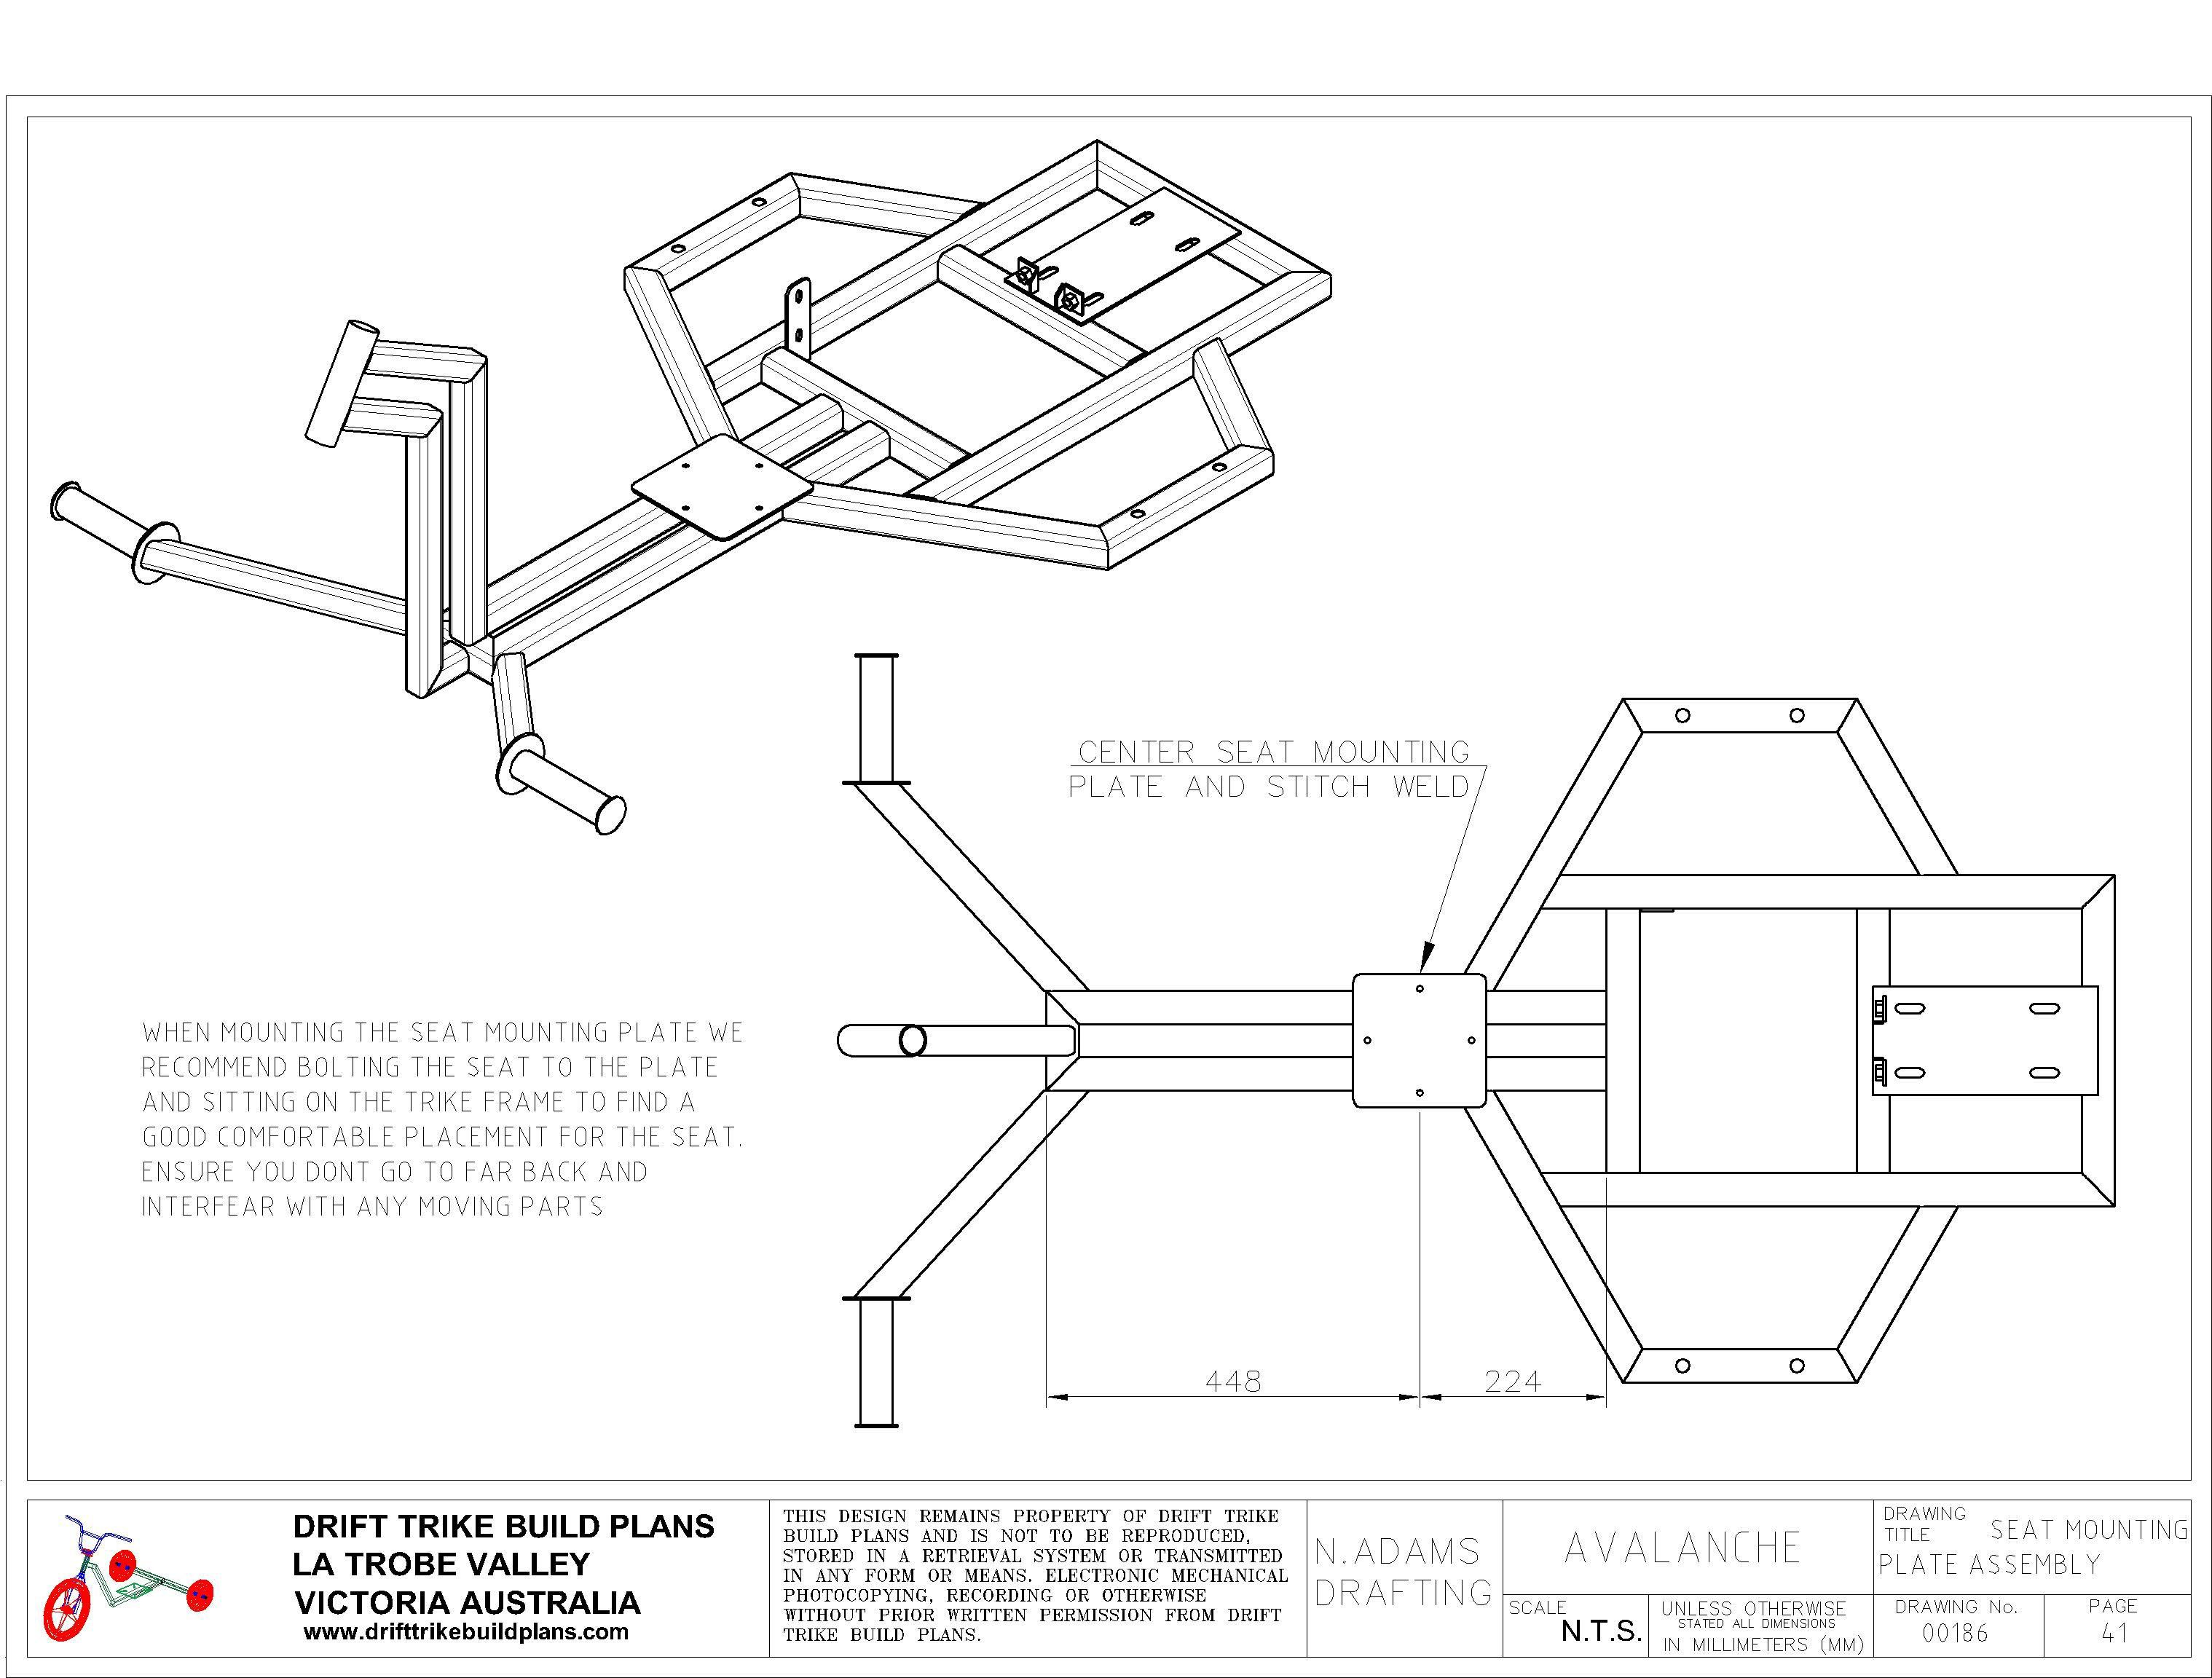 vw dune buggy wiring diagram tao 150 atv resultado de imagen para chasis trike con motor | pinterest drift trike, ...